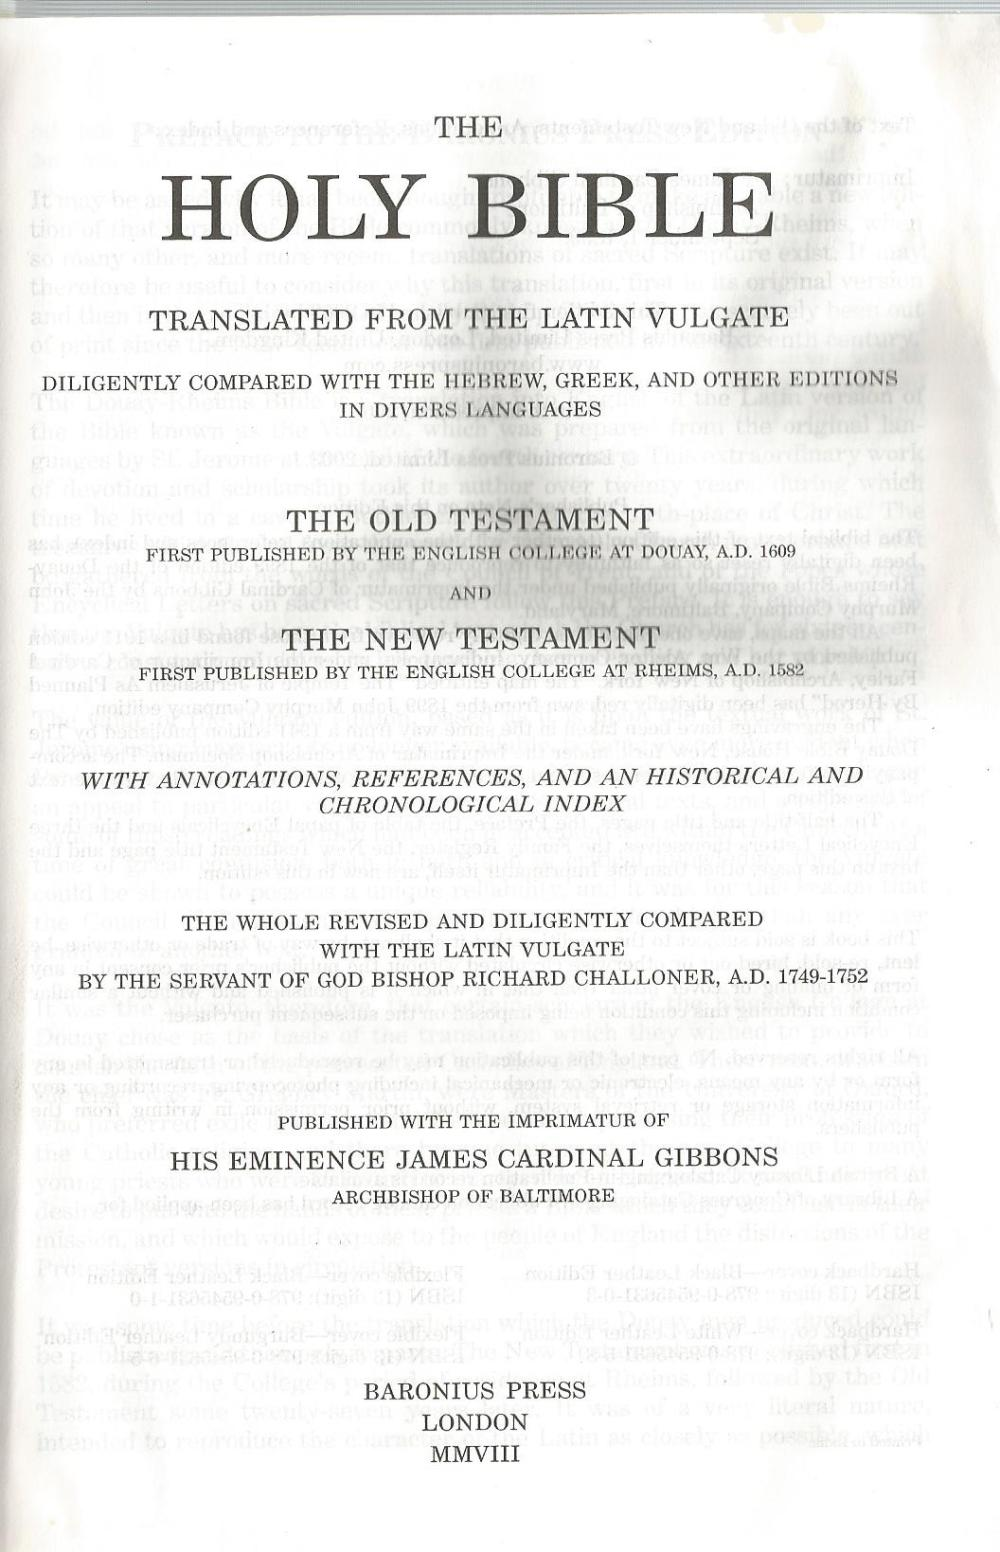 Douay-Rheims Bible Title Page